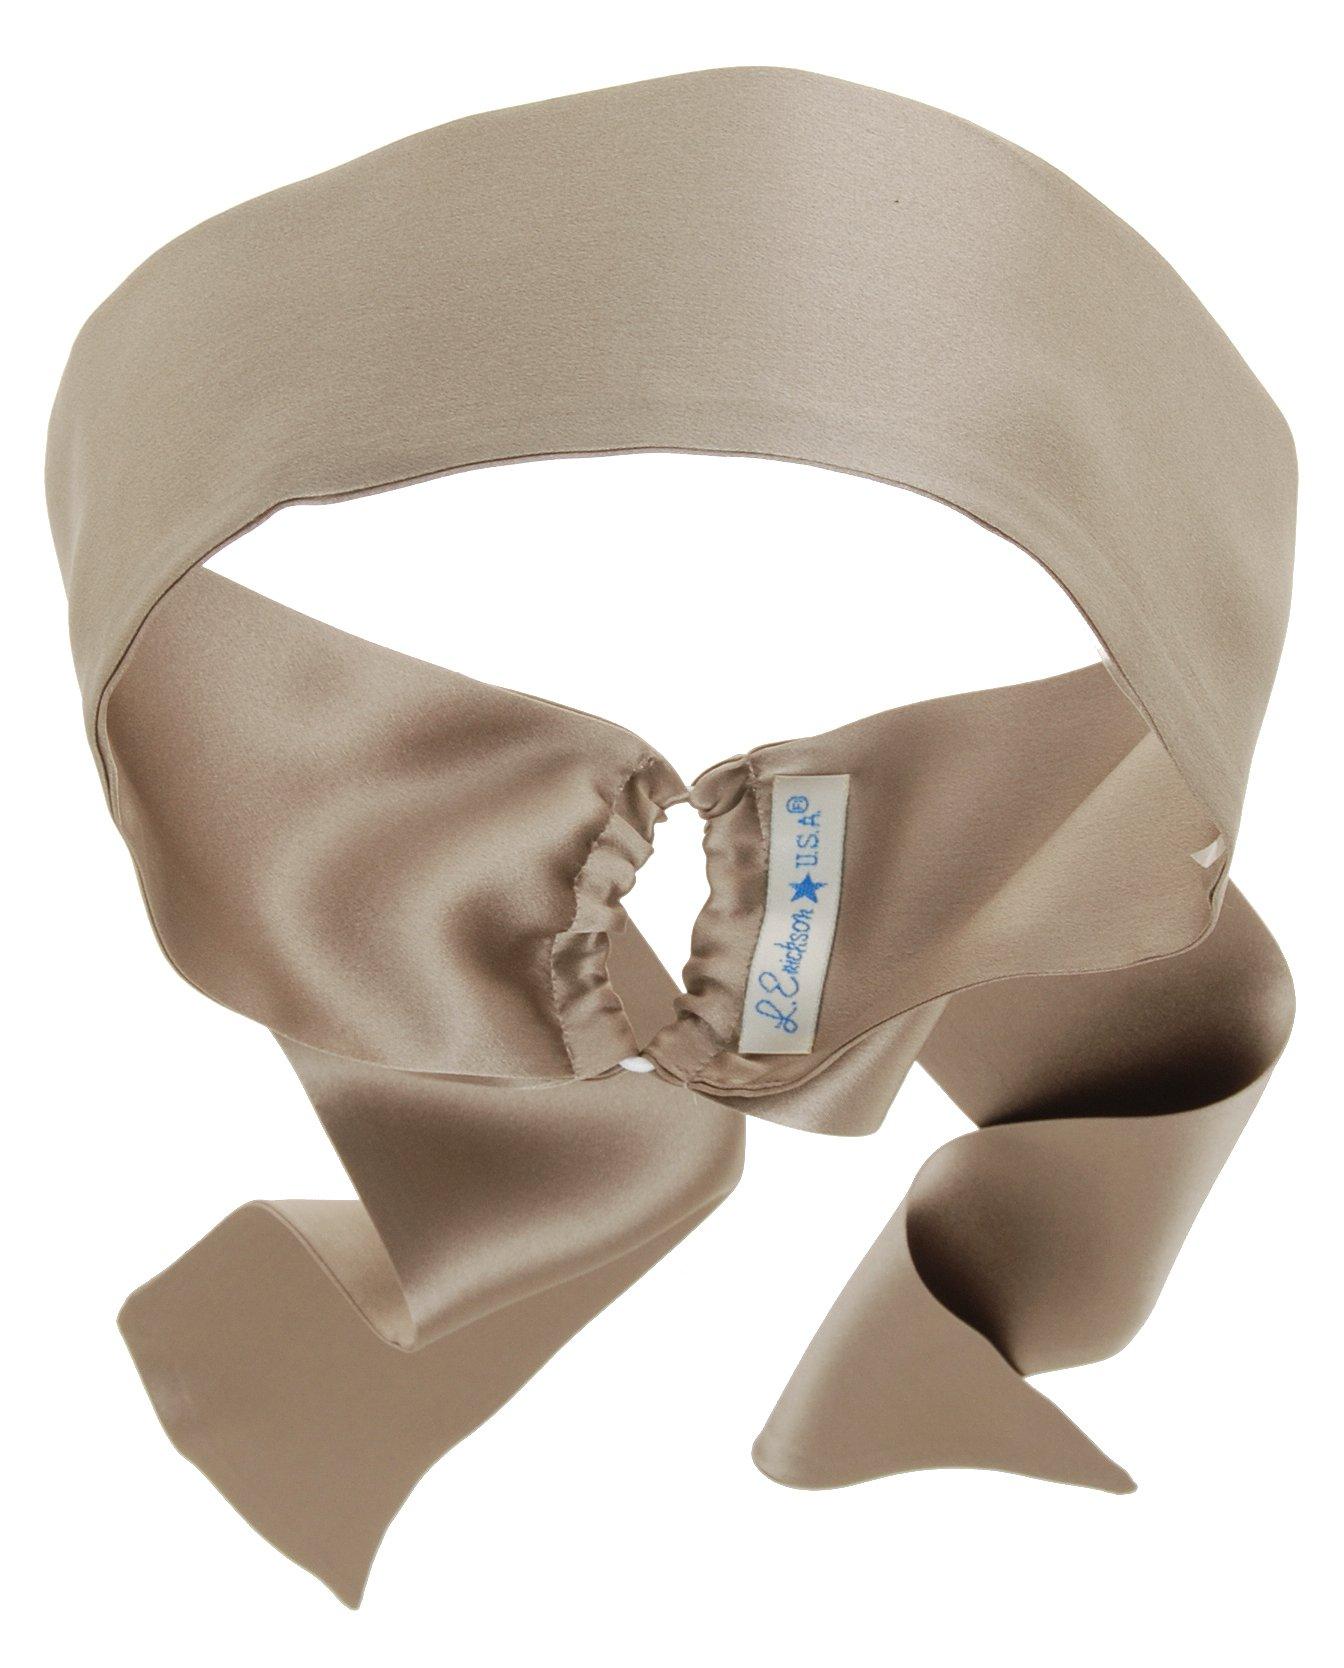 L. Erickson USA Elastic Loop Headband - Silk Charmeuse Thatched